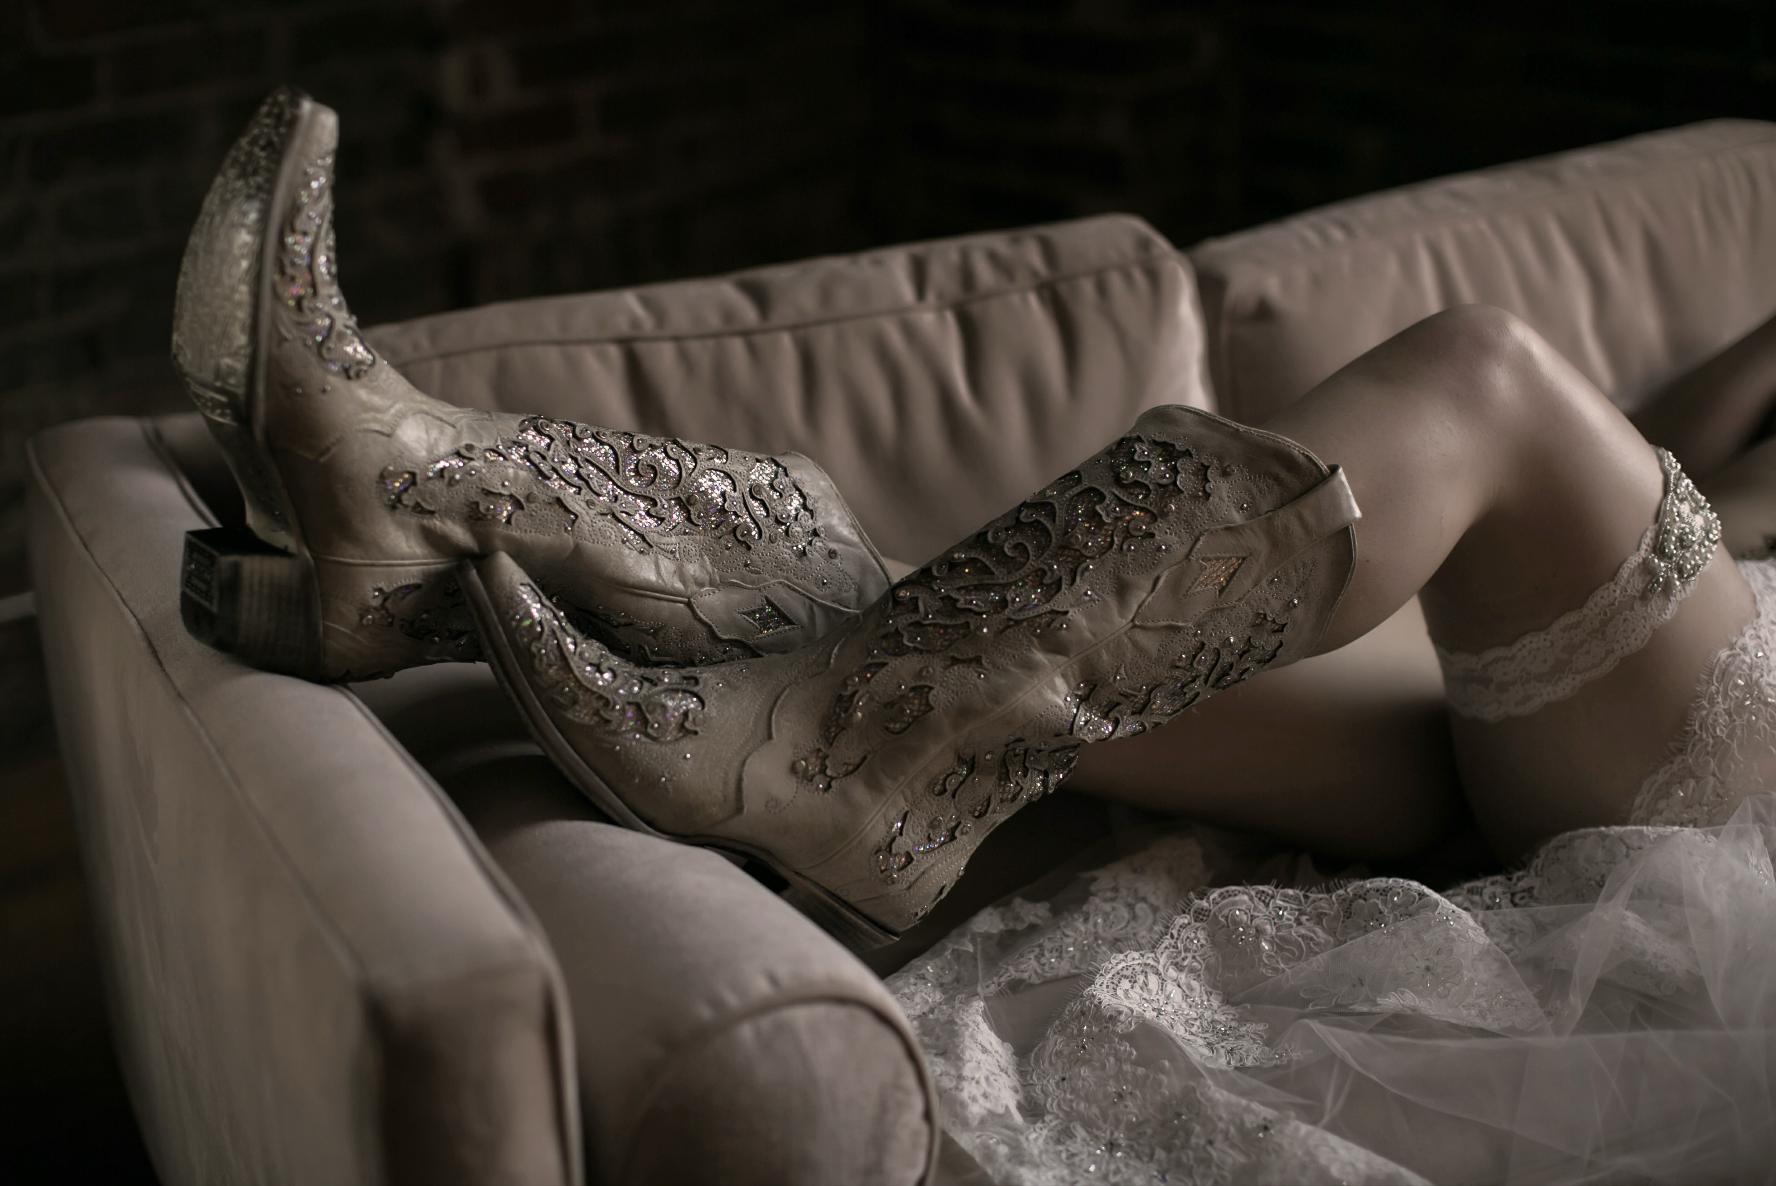 bridal boudoir atlanta, atlanta boudoir photographer, boudoir photography, wedding boudoir, sexy photos, cowboy boots